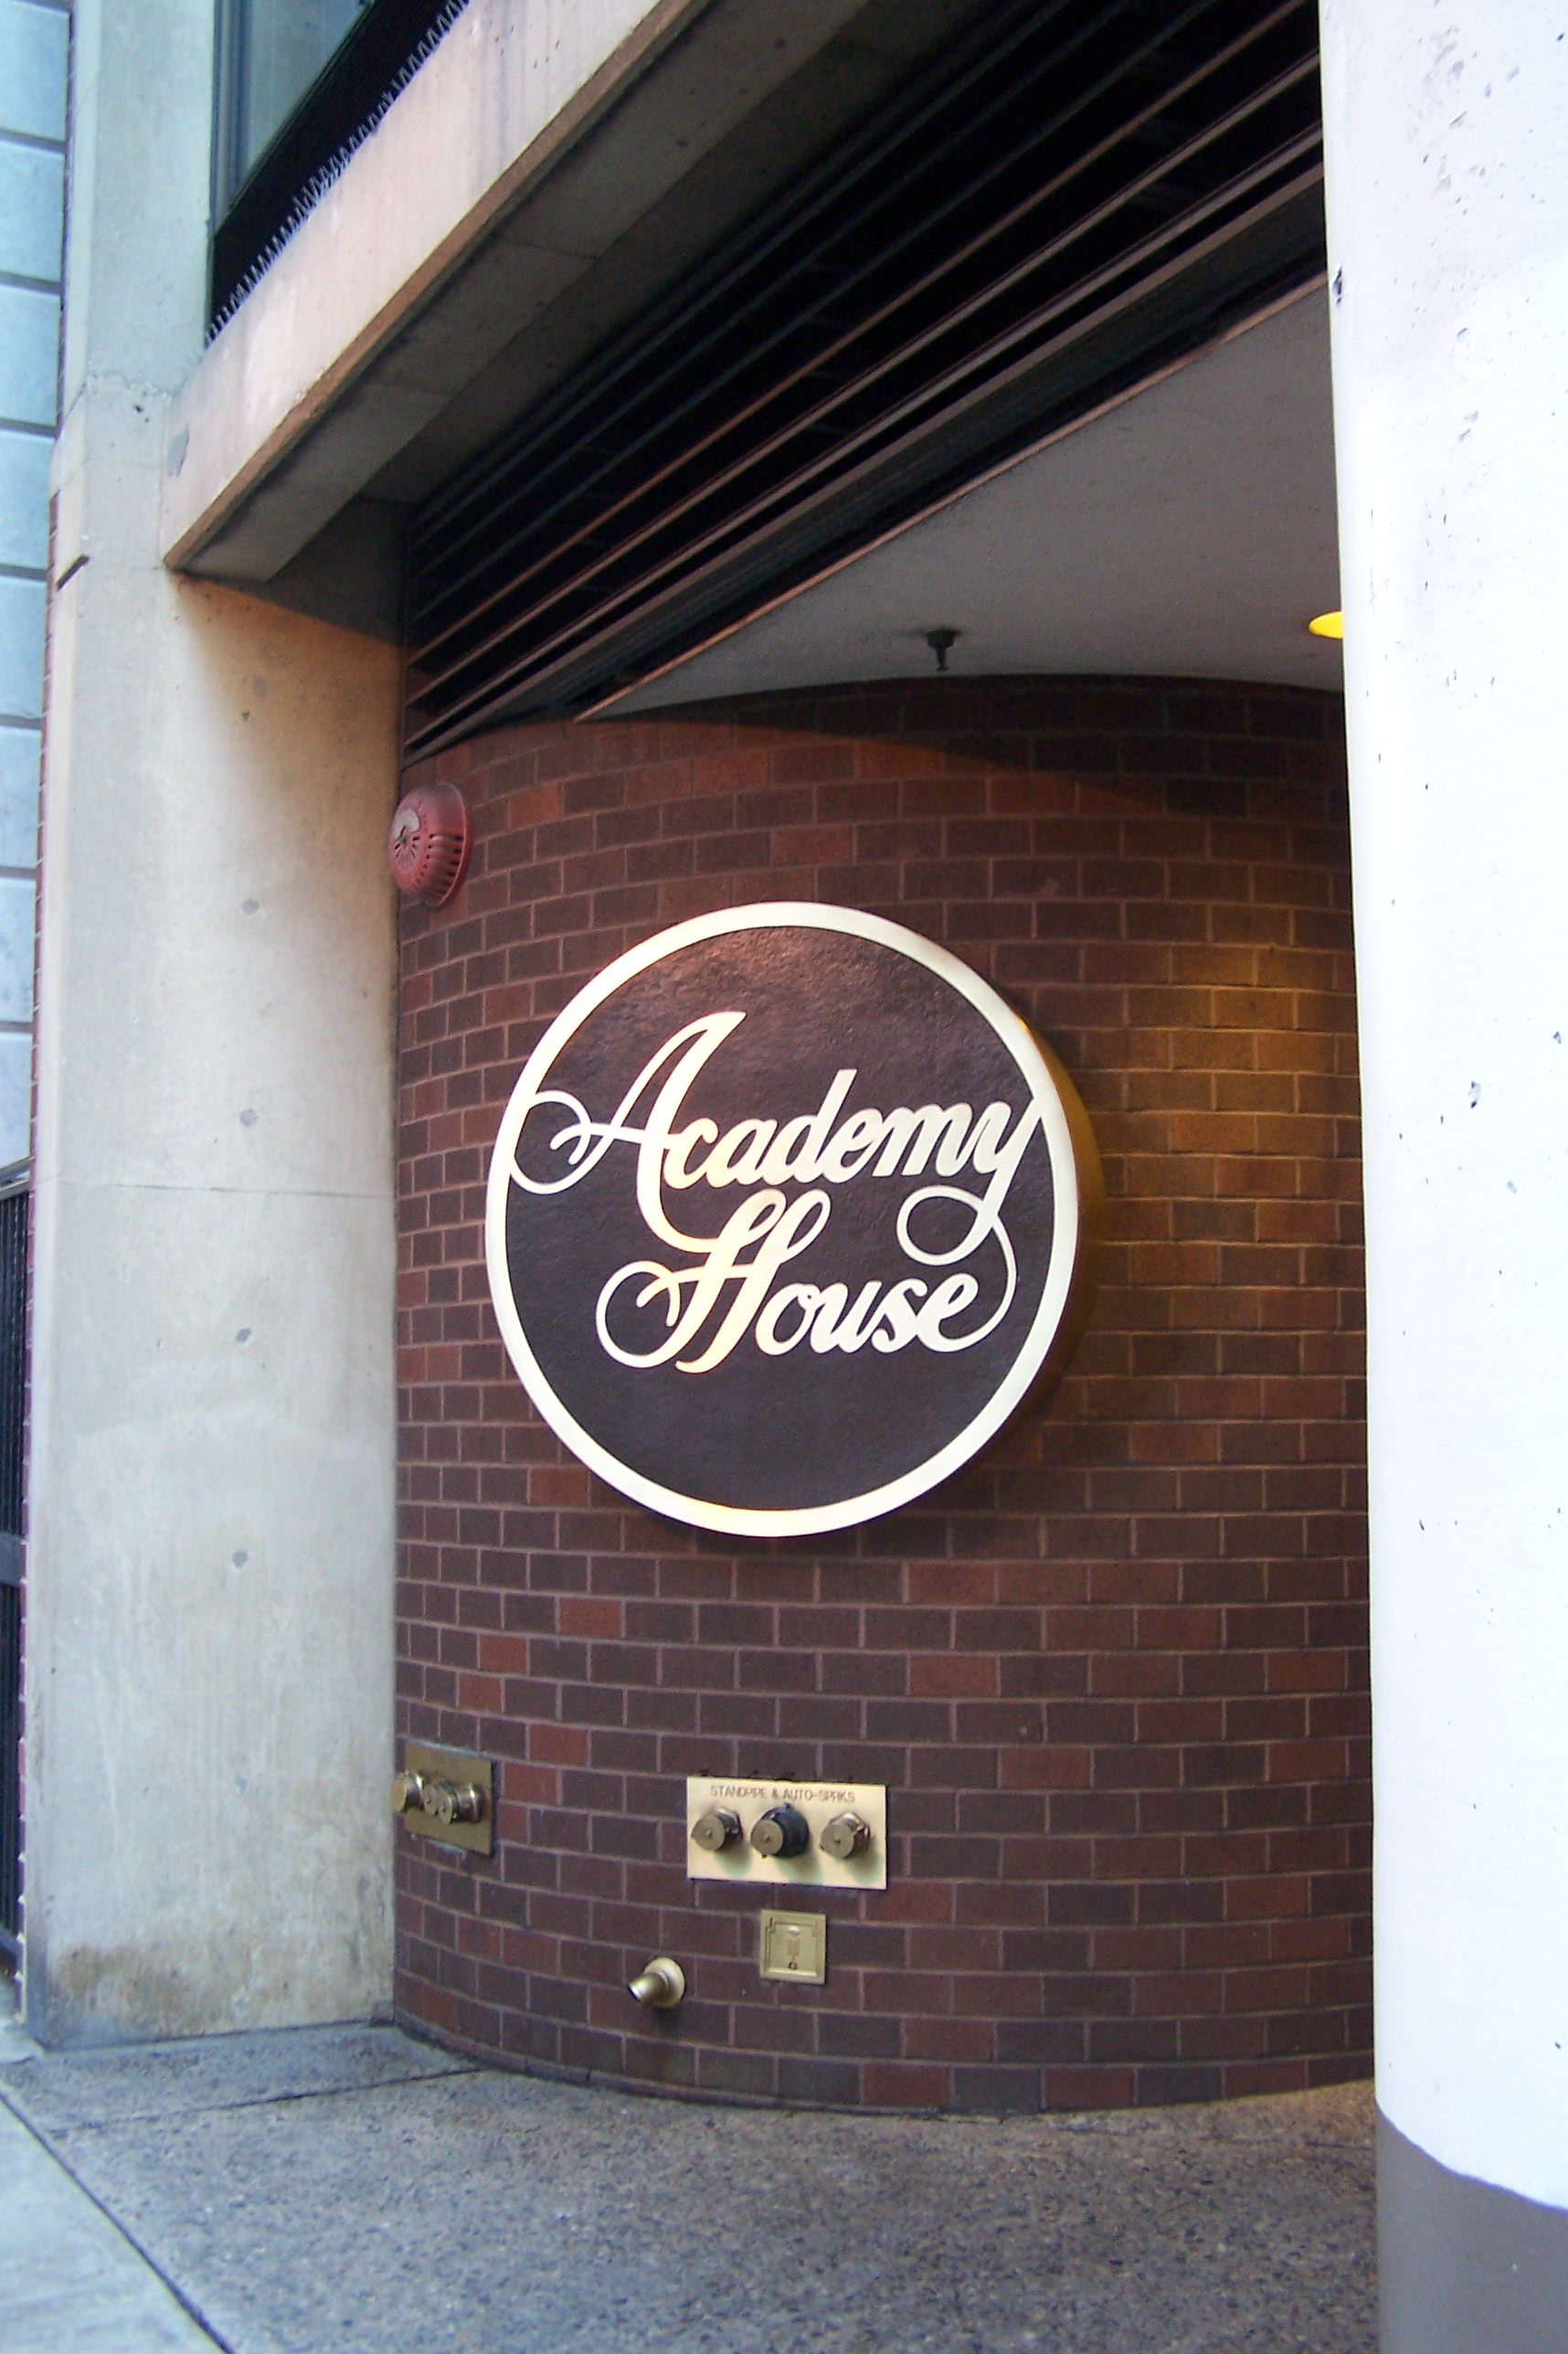 06-jrhutchjr-academyhouse-signage-15thst-05.JPG